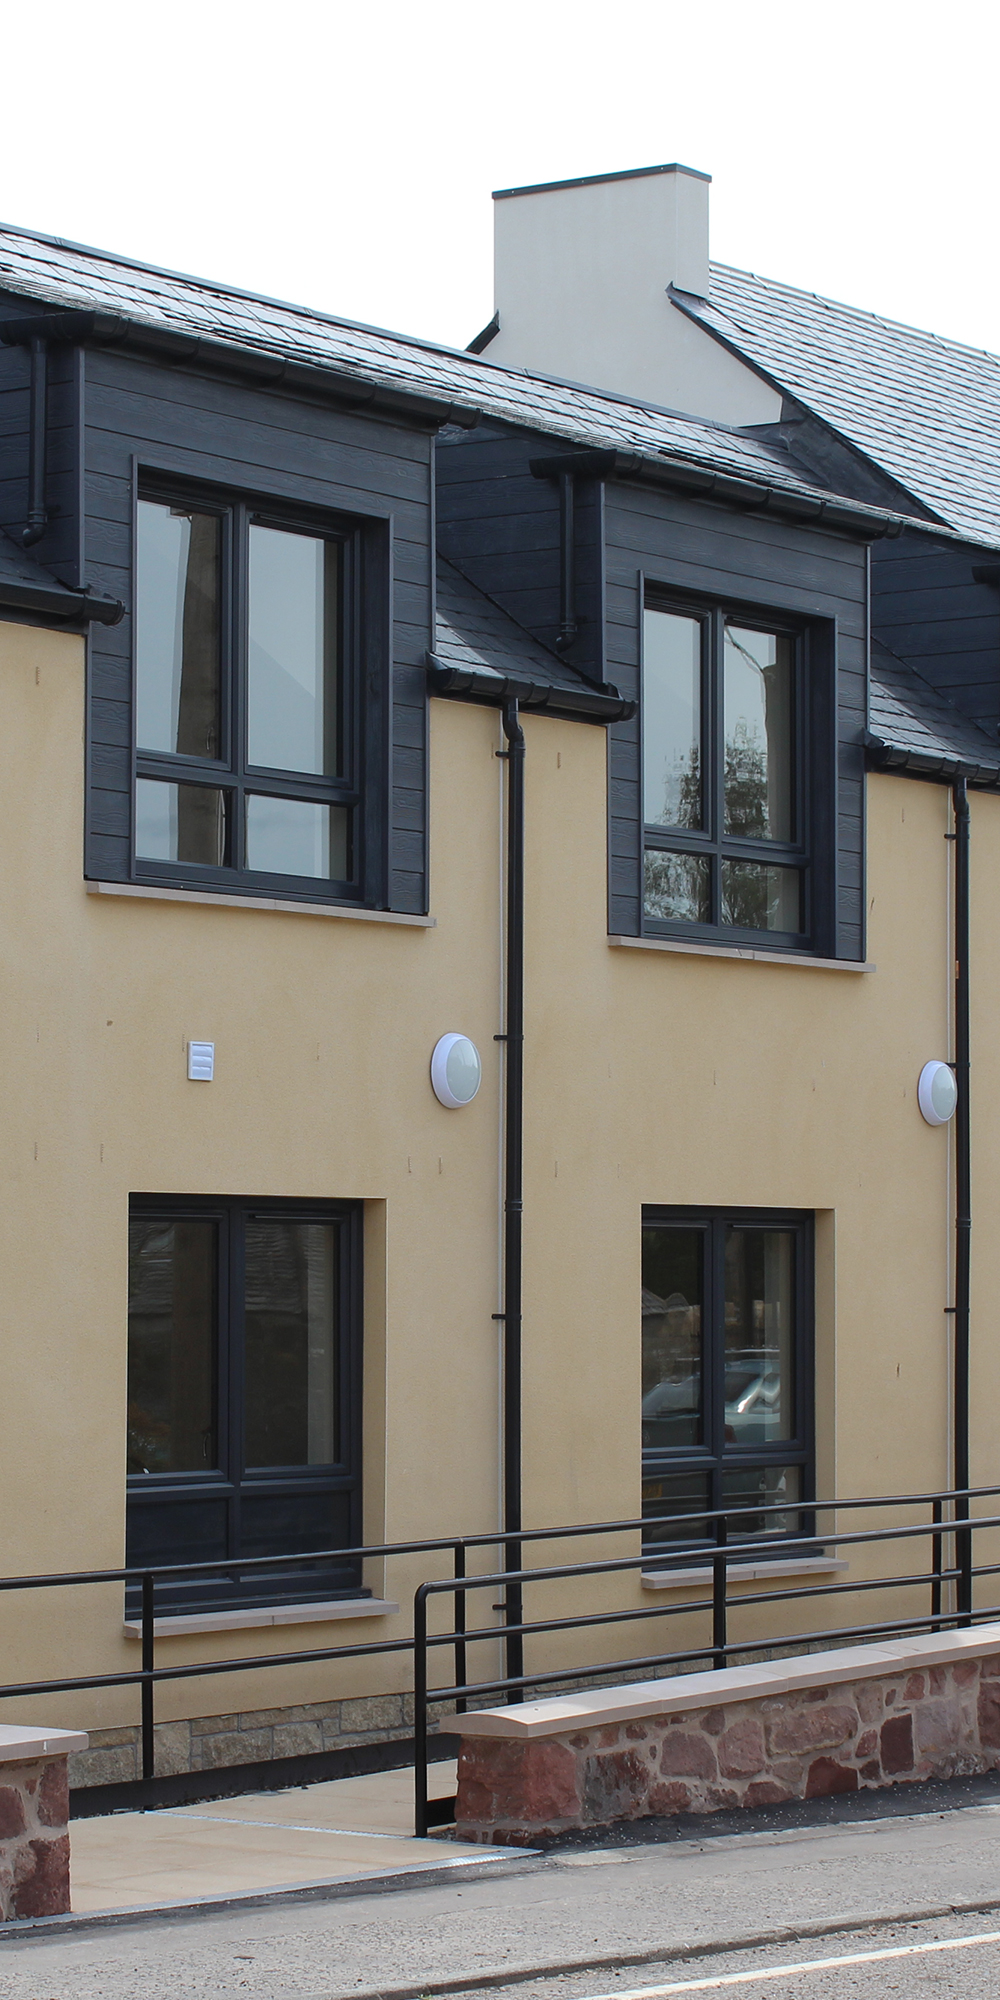 Wester Loan Housing Association